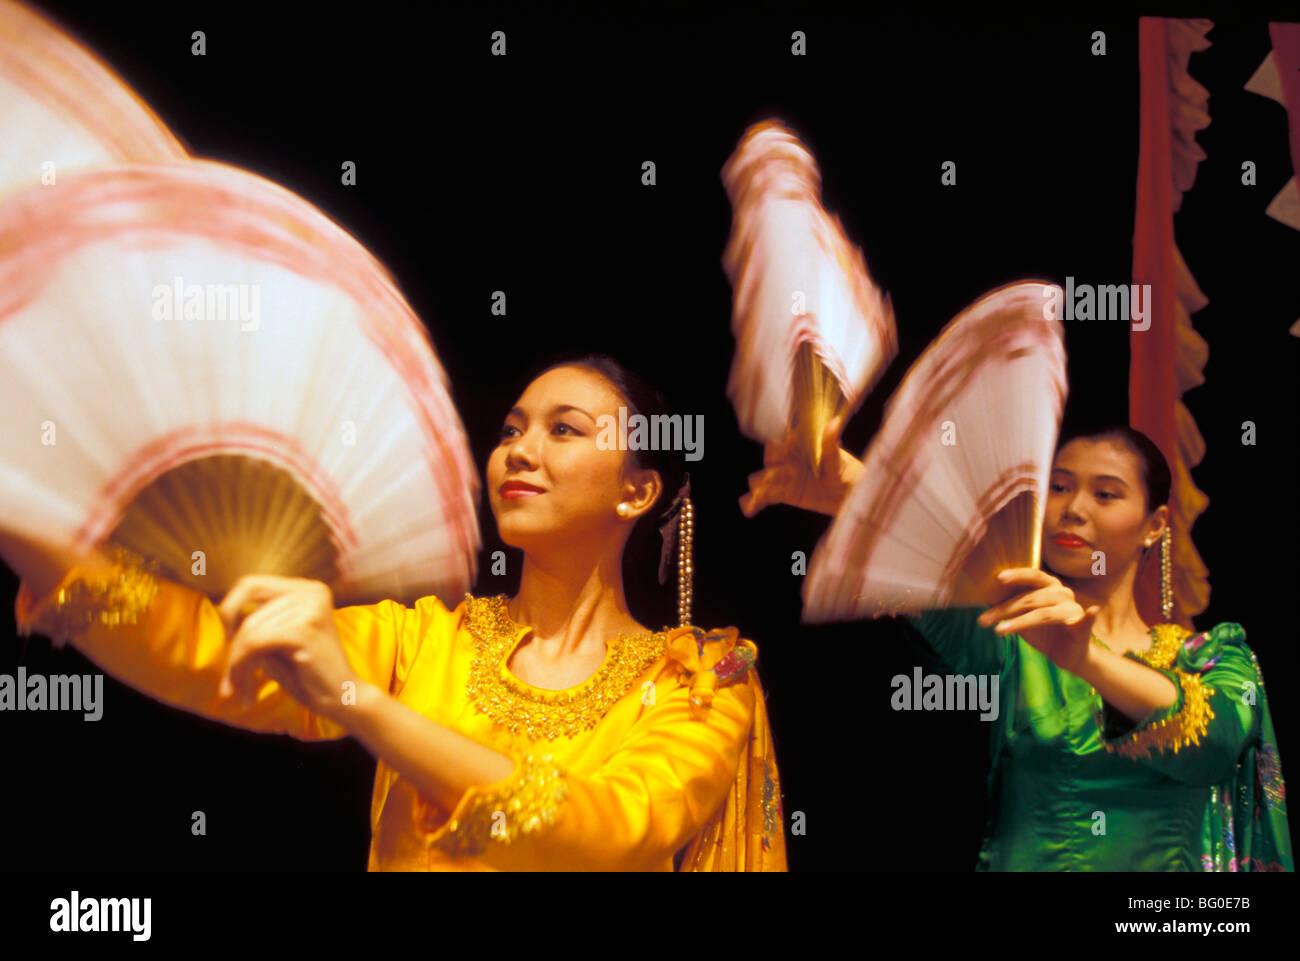 Filipino dancers, Philippines, Southeast Asia, Asia - Stock Image